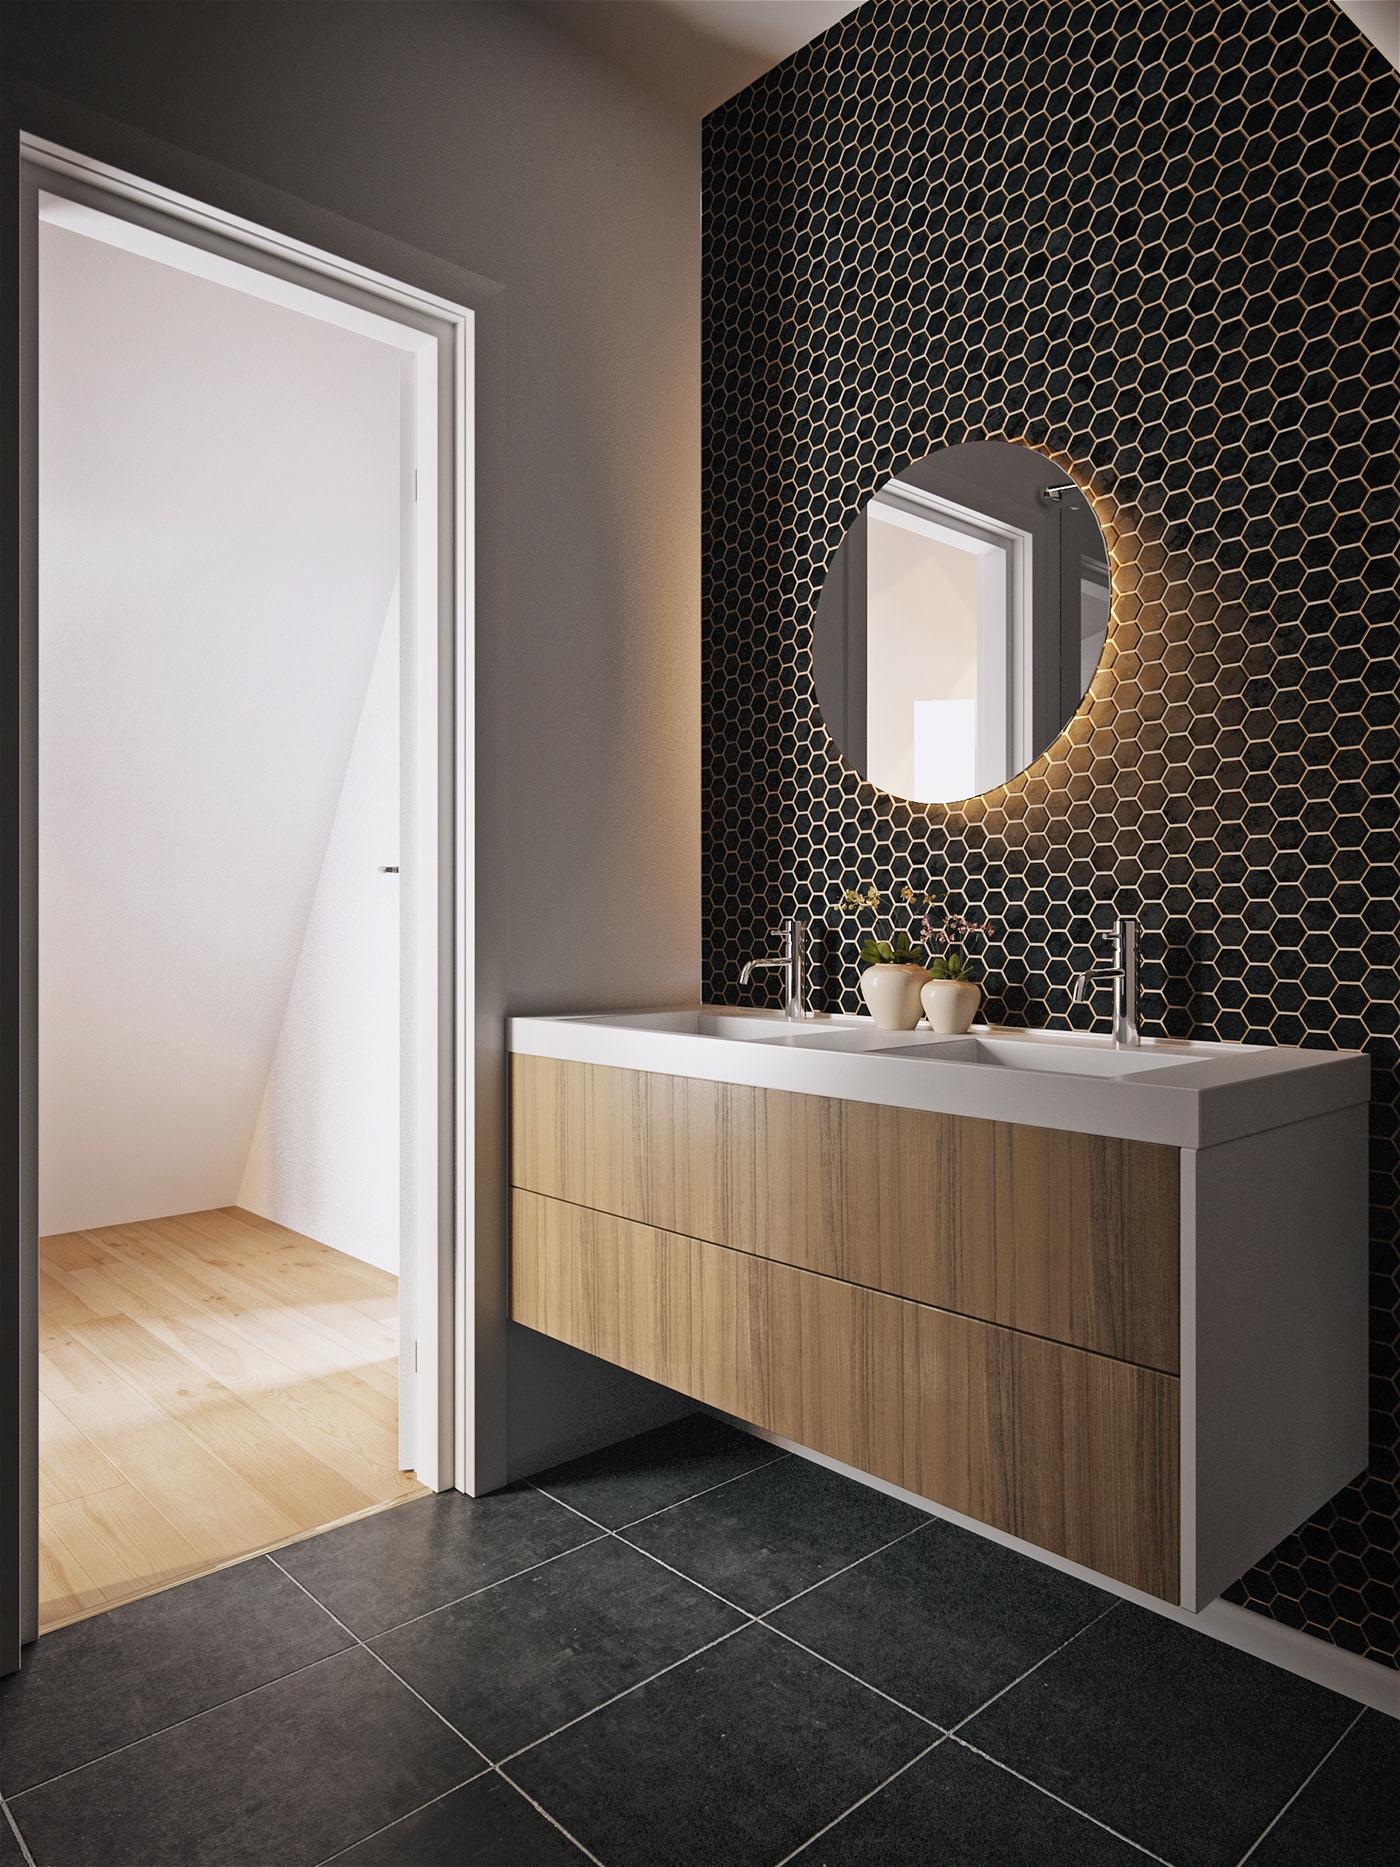 Interior faraday3d visualization 3D architecture